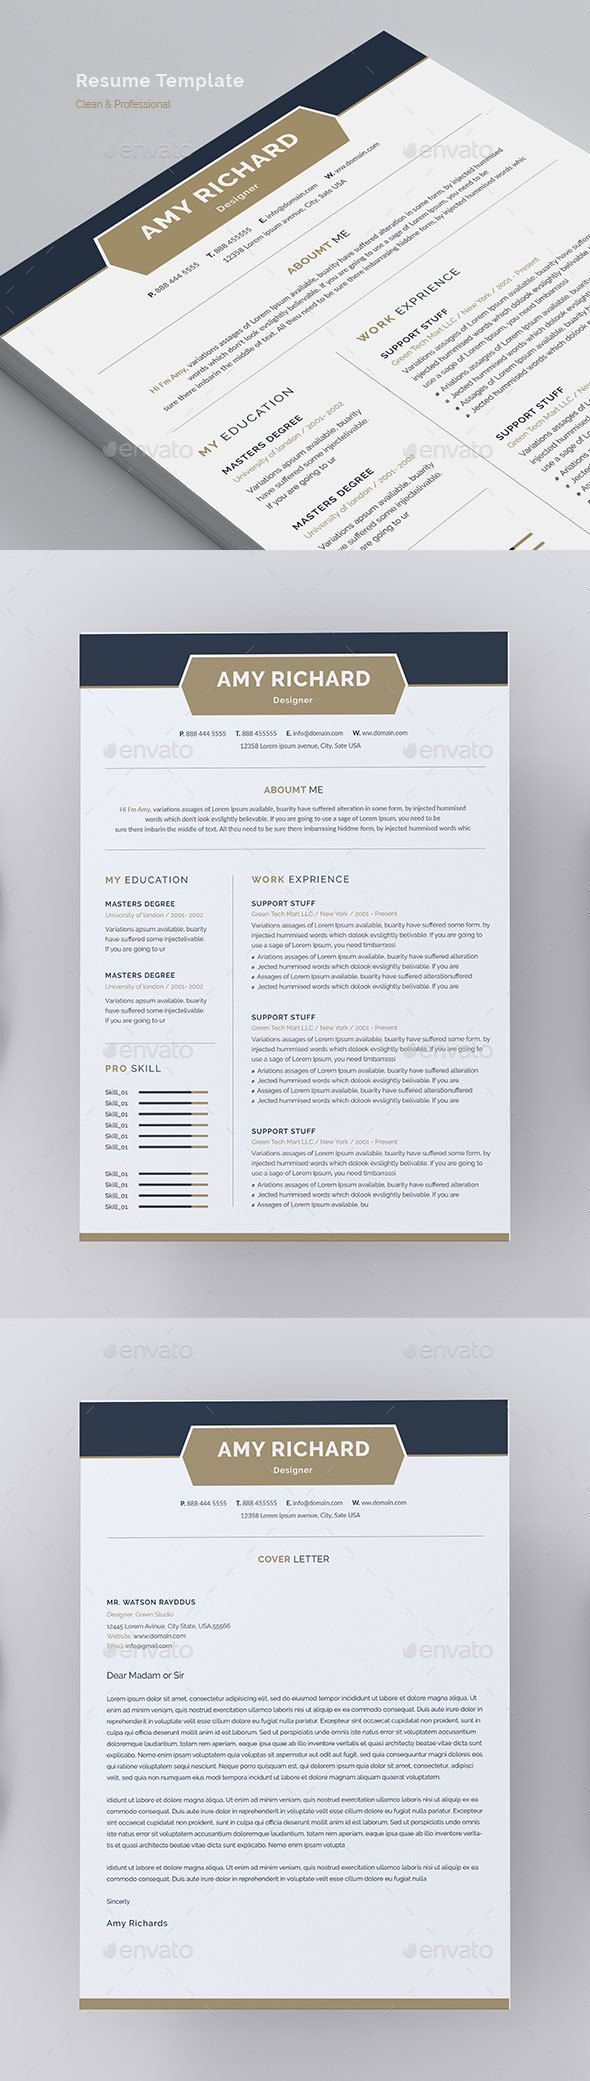 Resume Resumes Stationery Resume design template